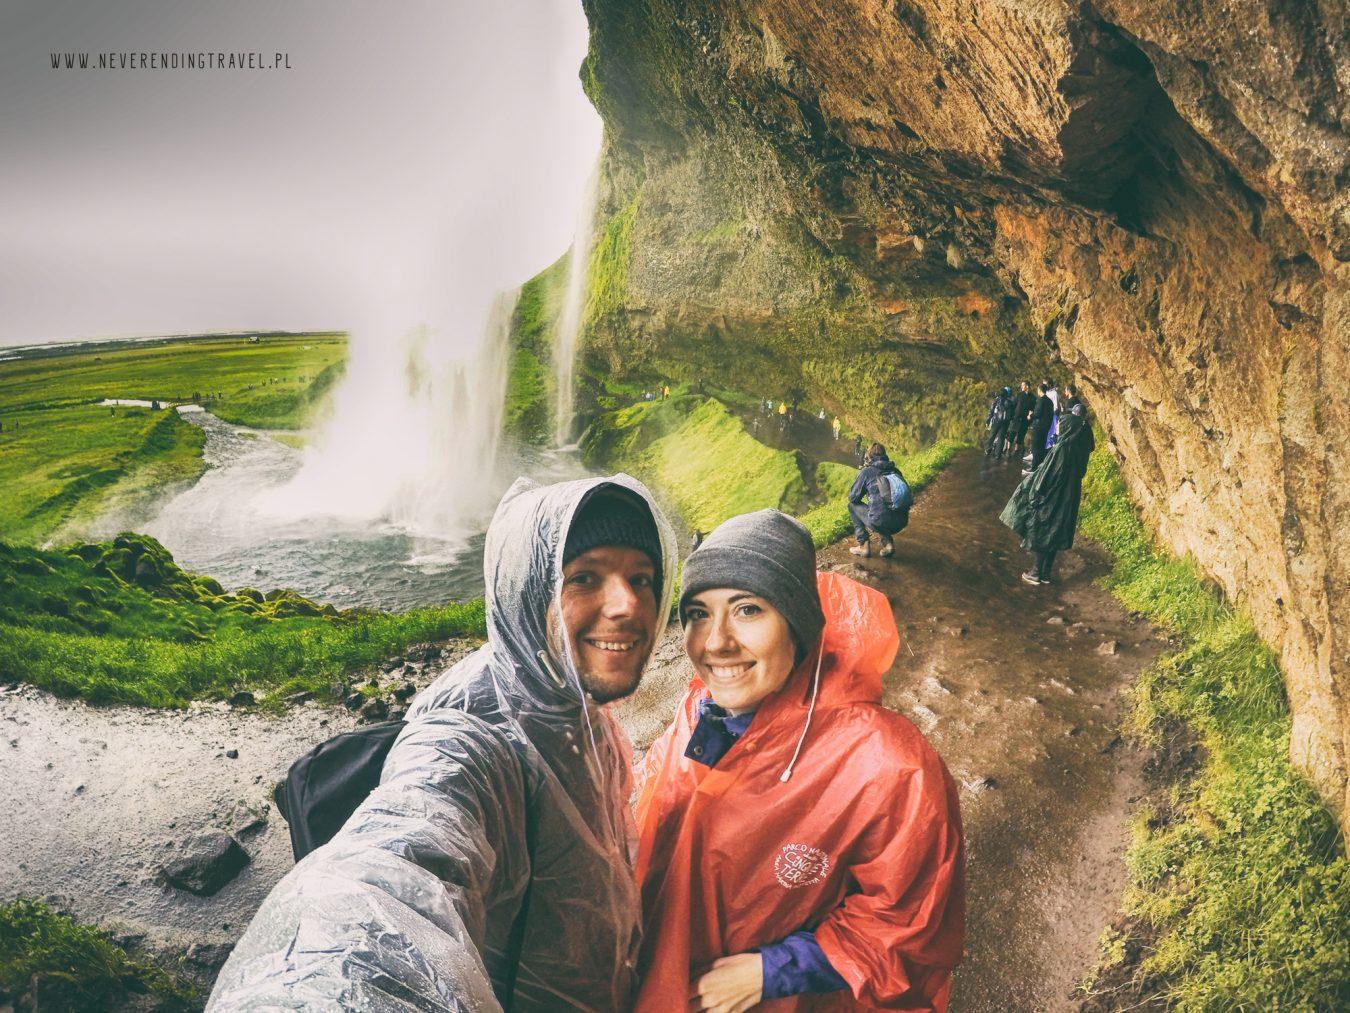 Seljalandsfoss islandzki wodospad neverendingtravel.pl my na tle wodospadu